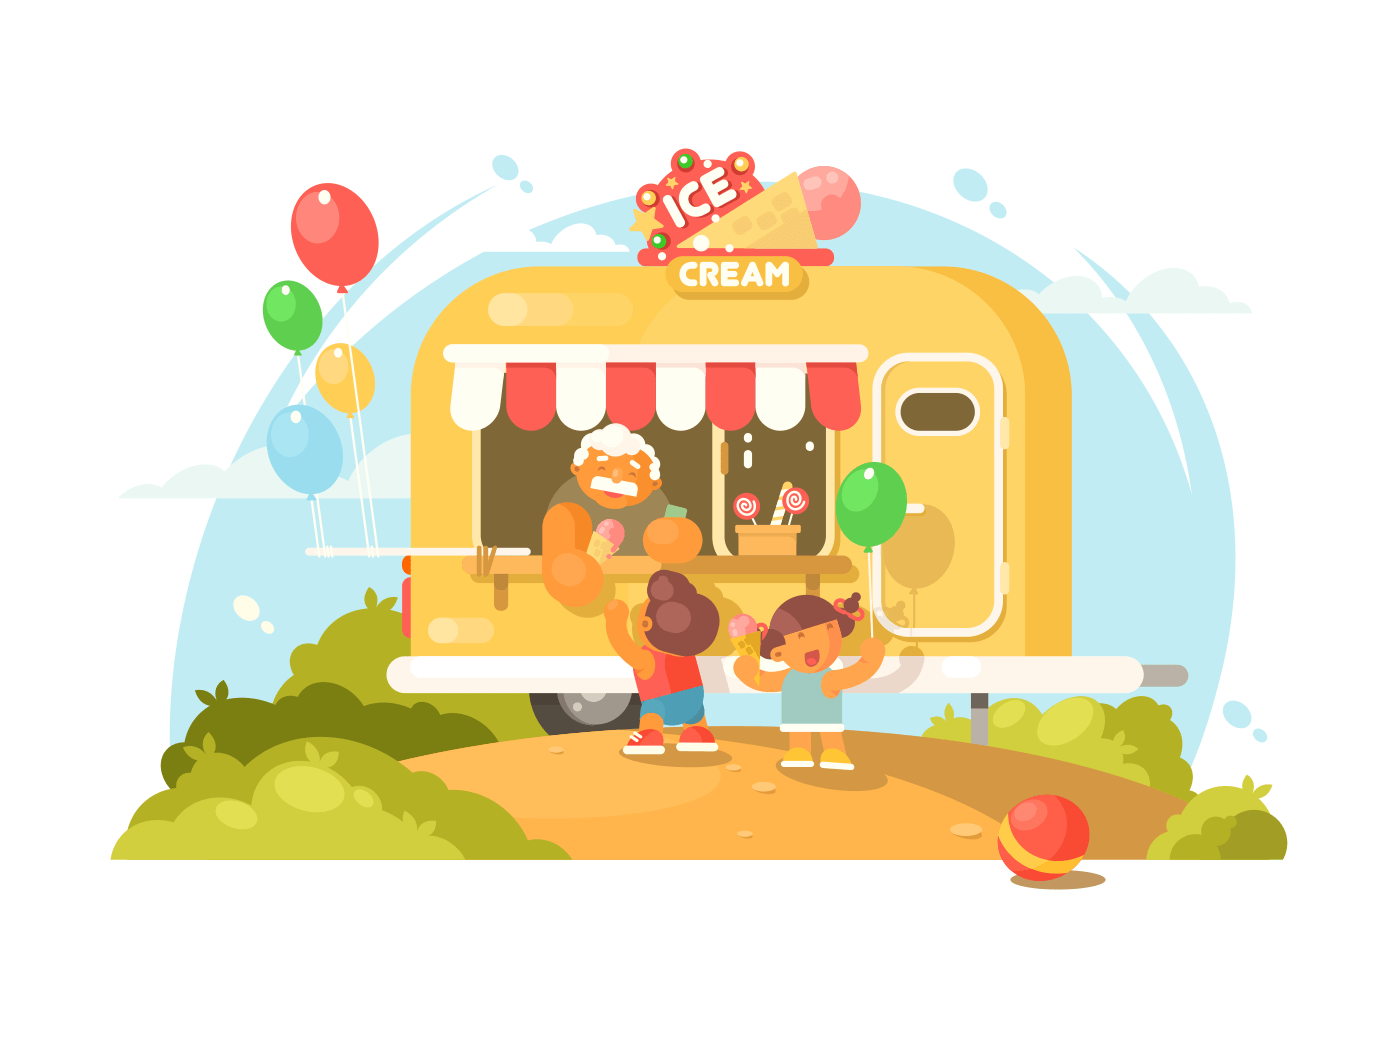 Ice cream van illustration